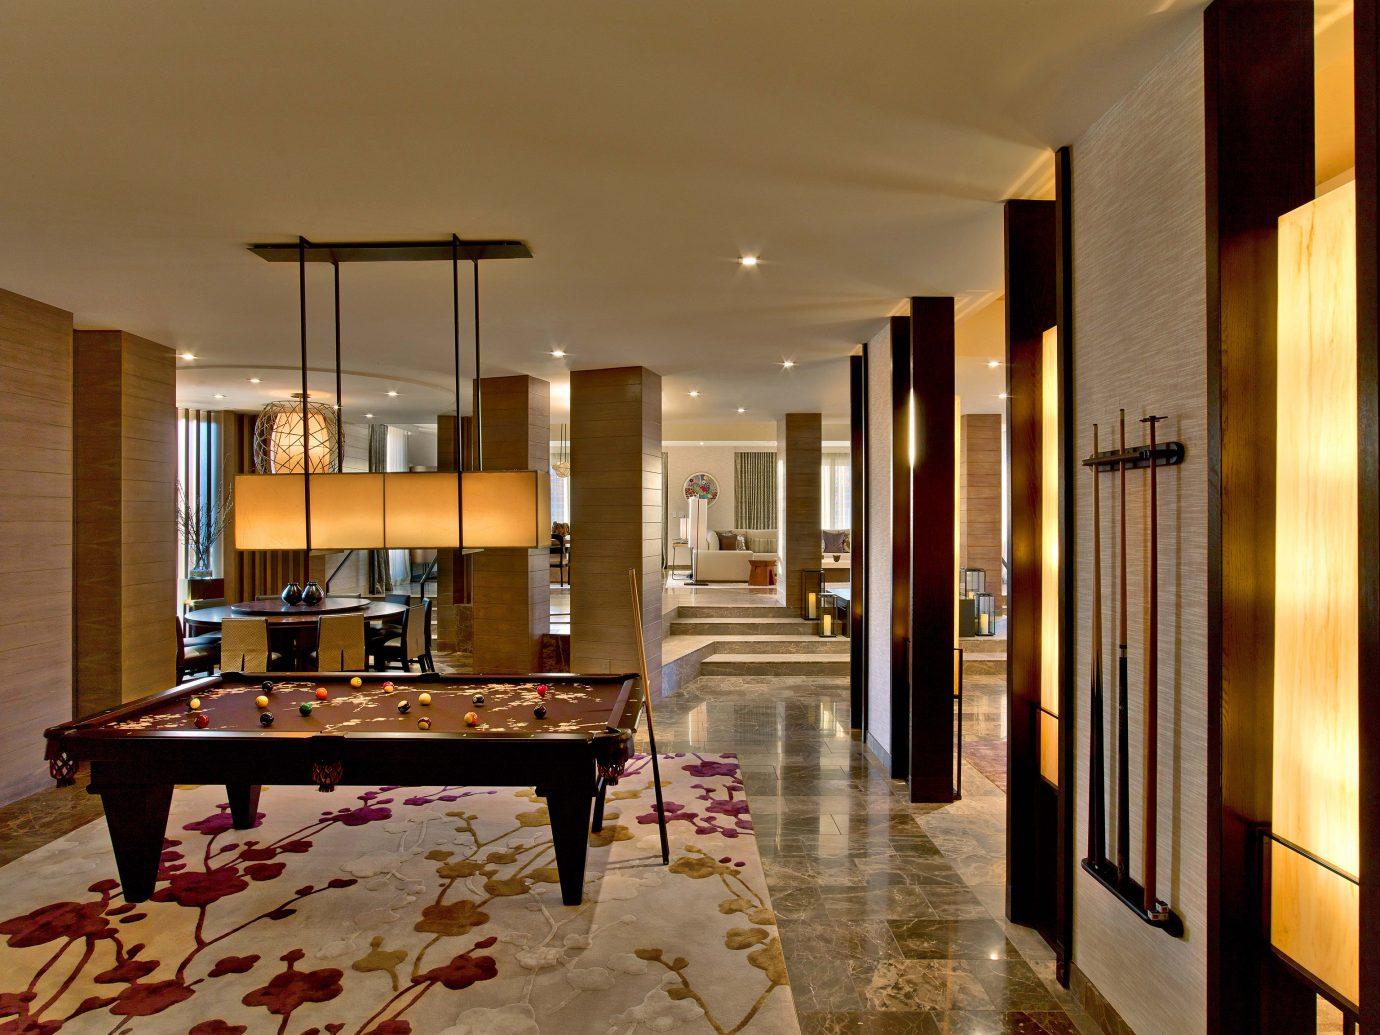 The Nobu Villa suite at the Nobu Hotel in Las Vegas